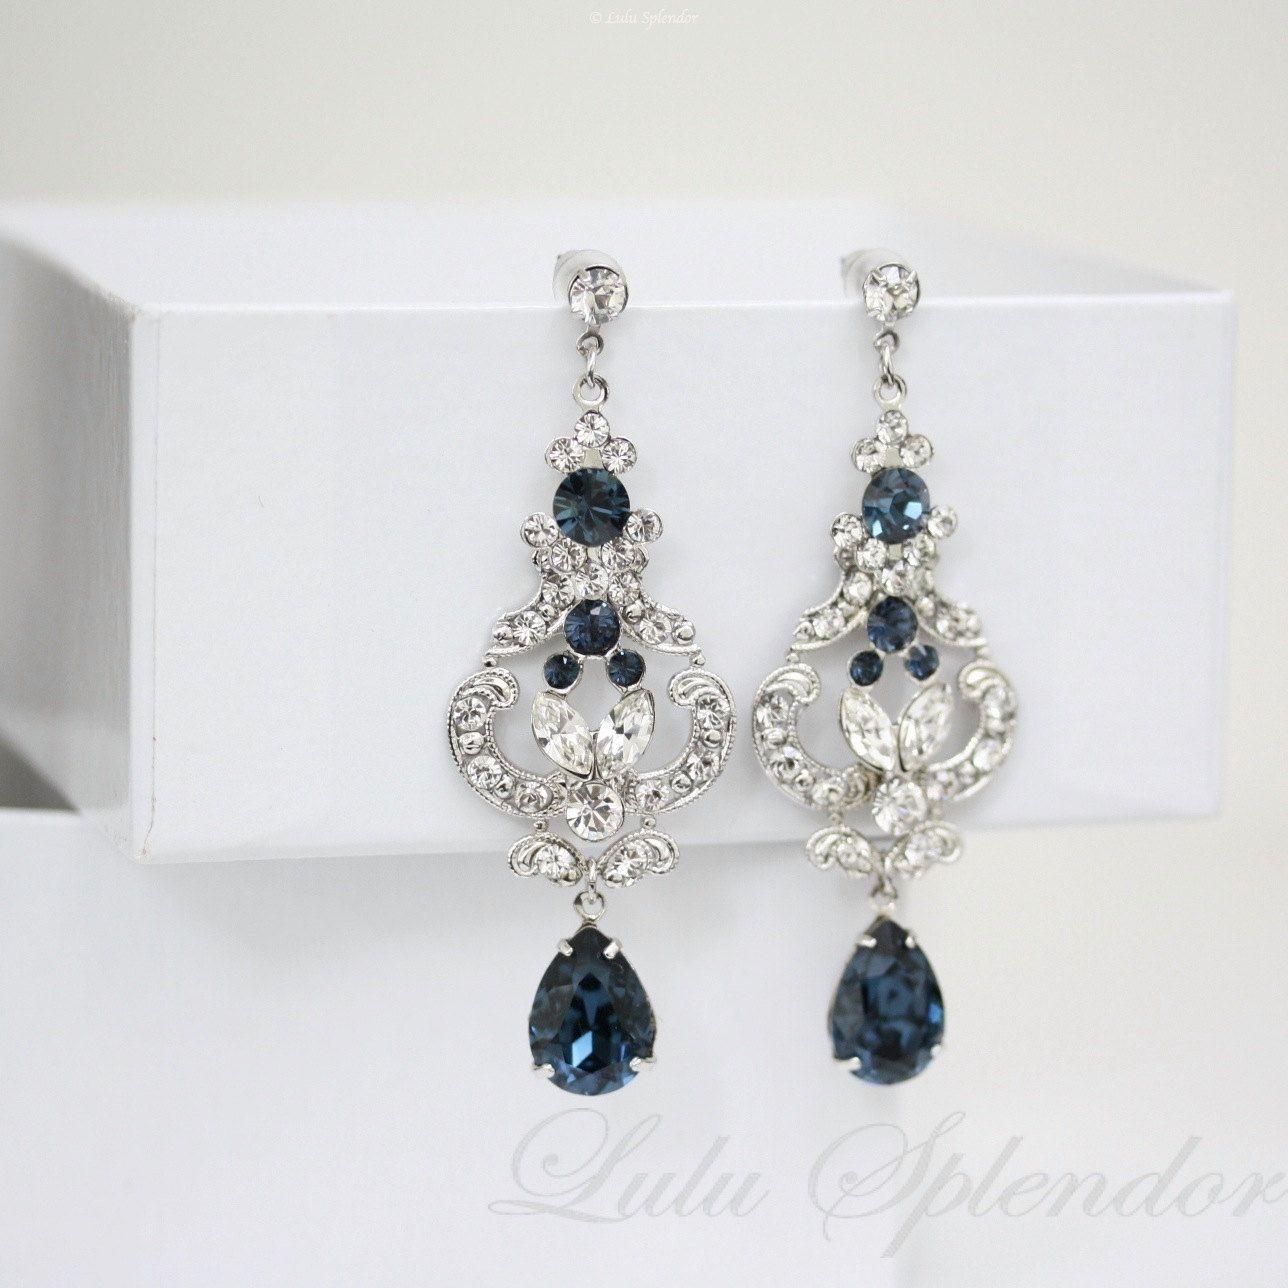 Blue Rhinestone Bridal Earrings Swarovski Crystal Chandelier Montana Wedding Jewelry Frances Mid 79 00 Via